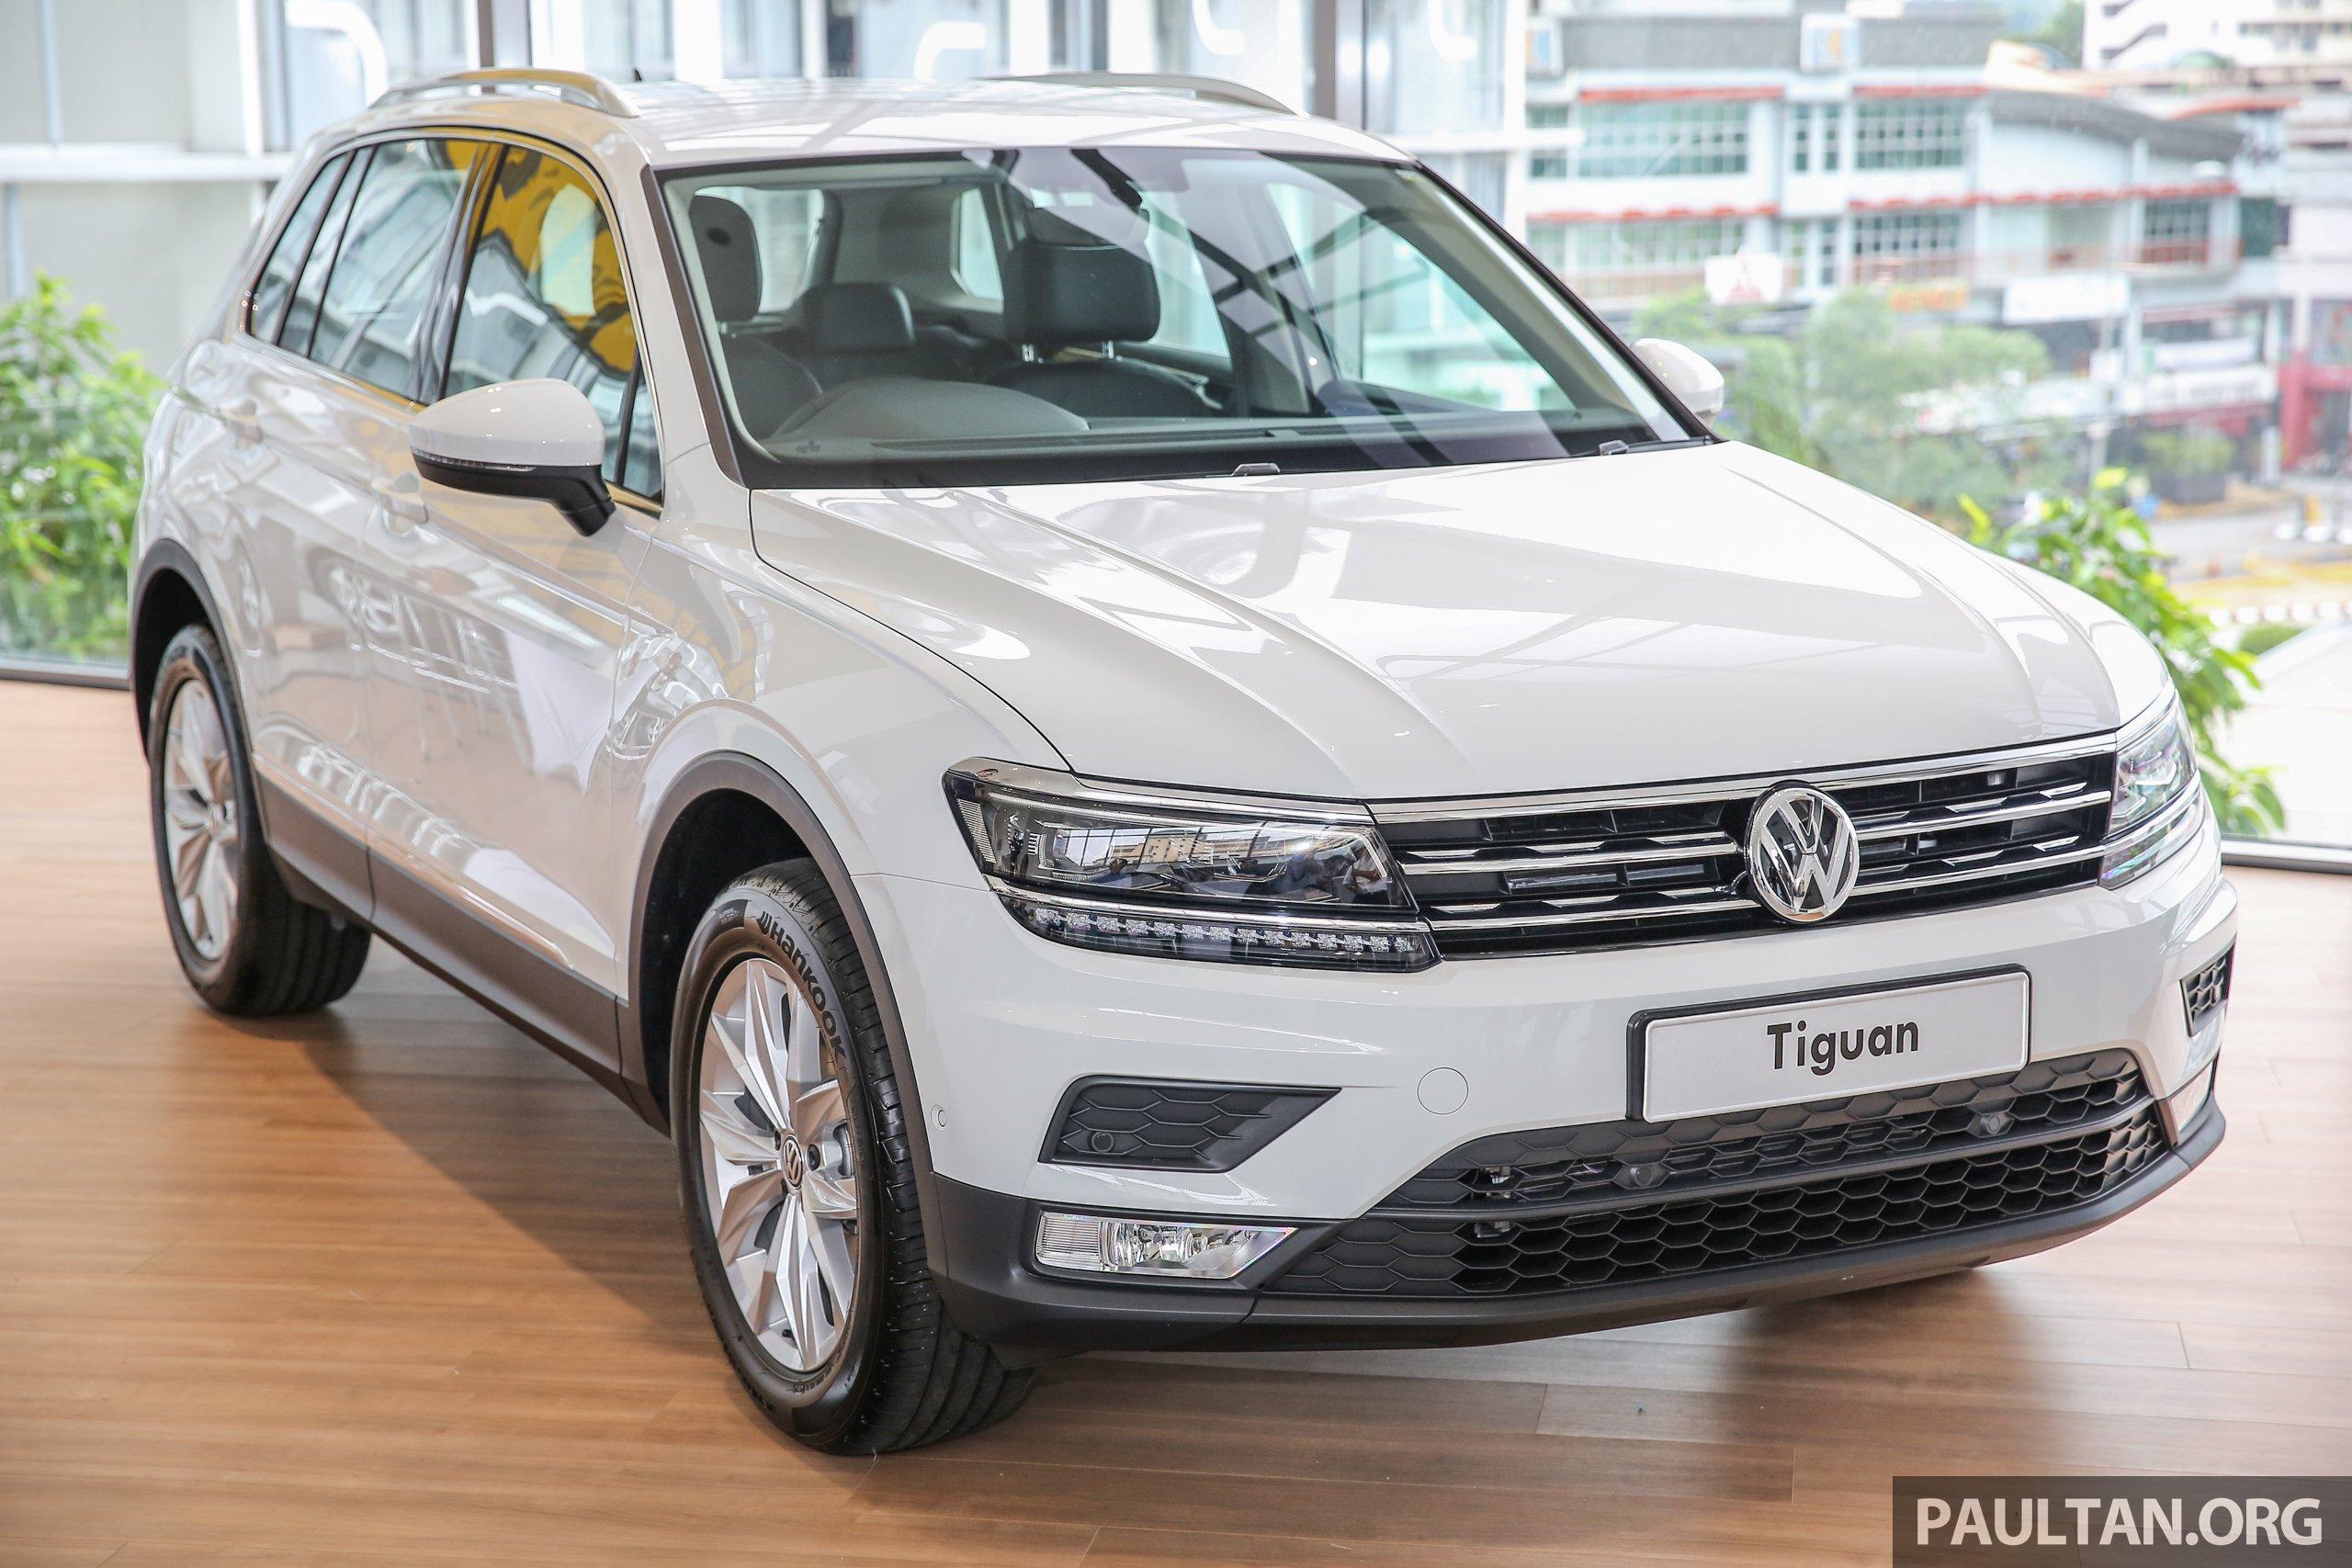 New Volkswagen Tiguan 1 4 Tsi In Malaysia Fr Rm149k Image